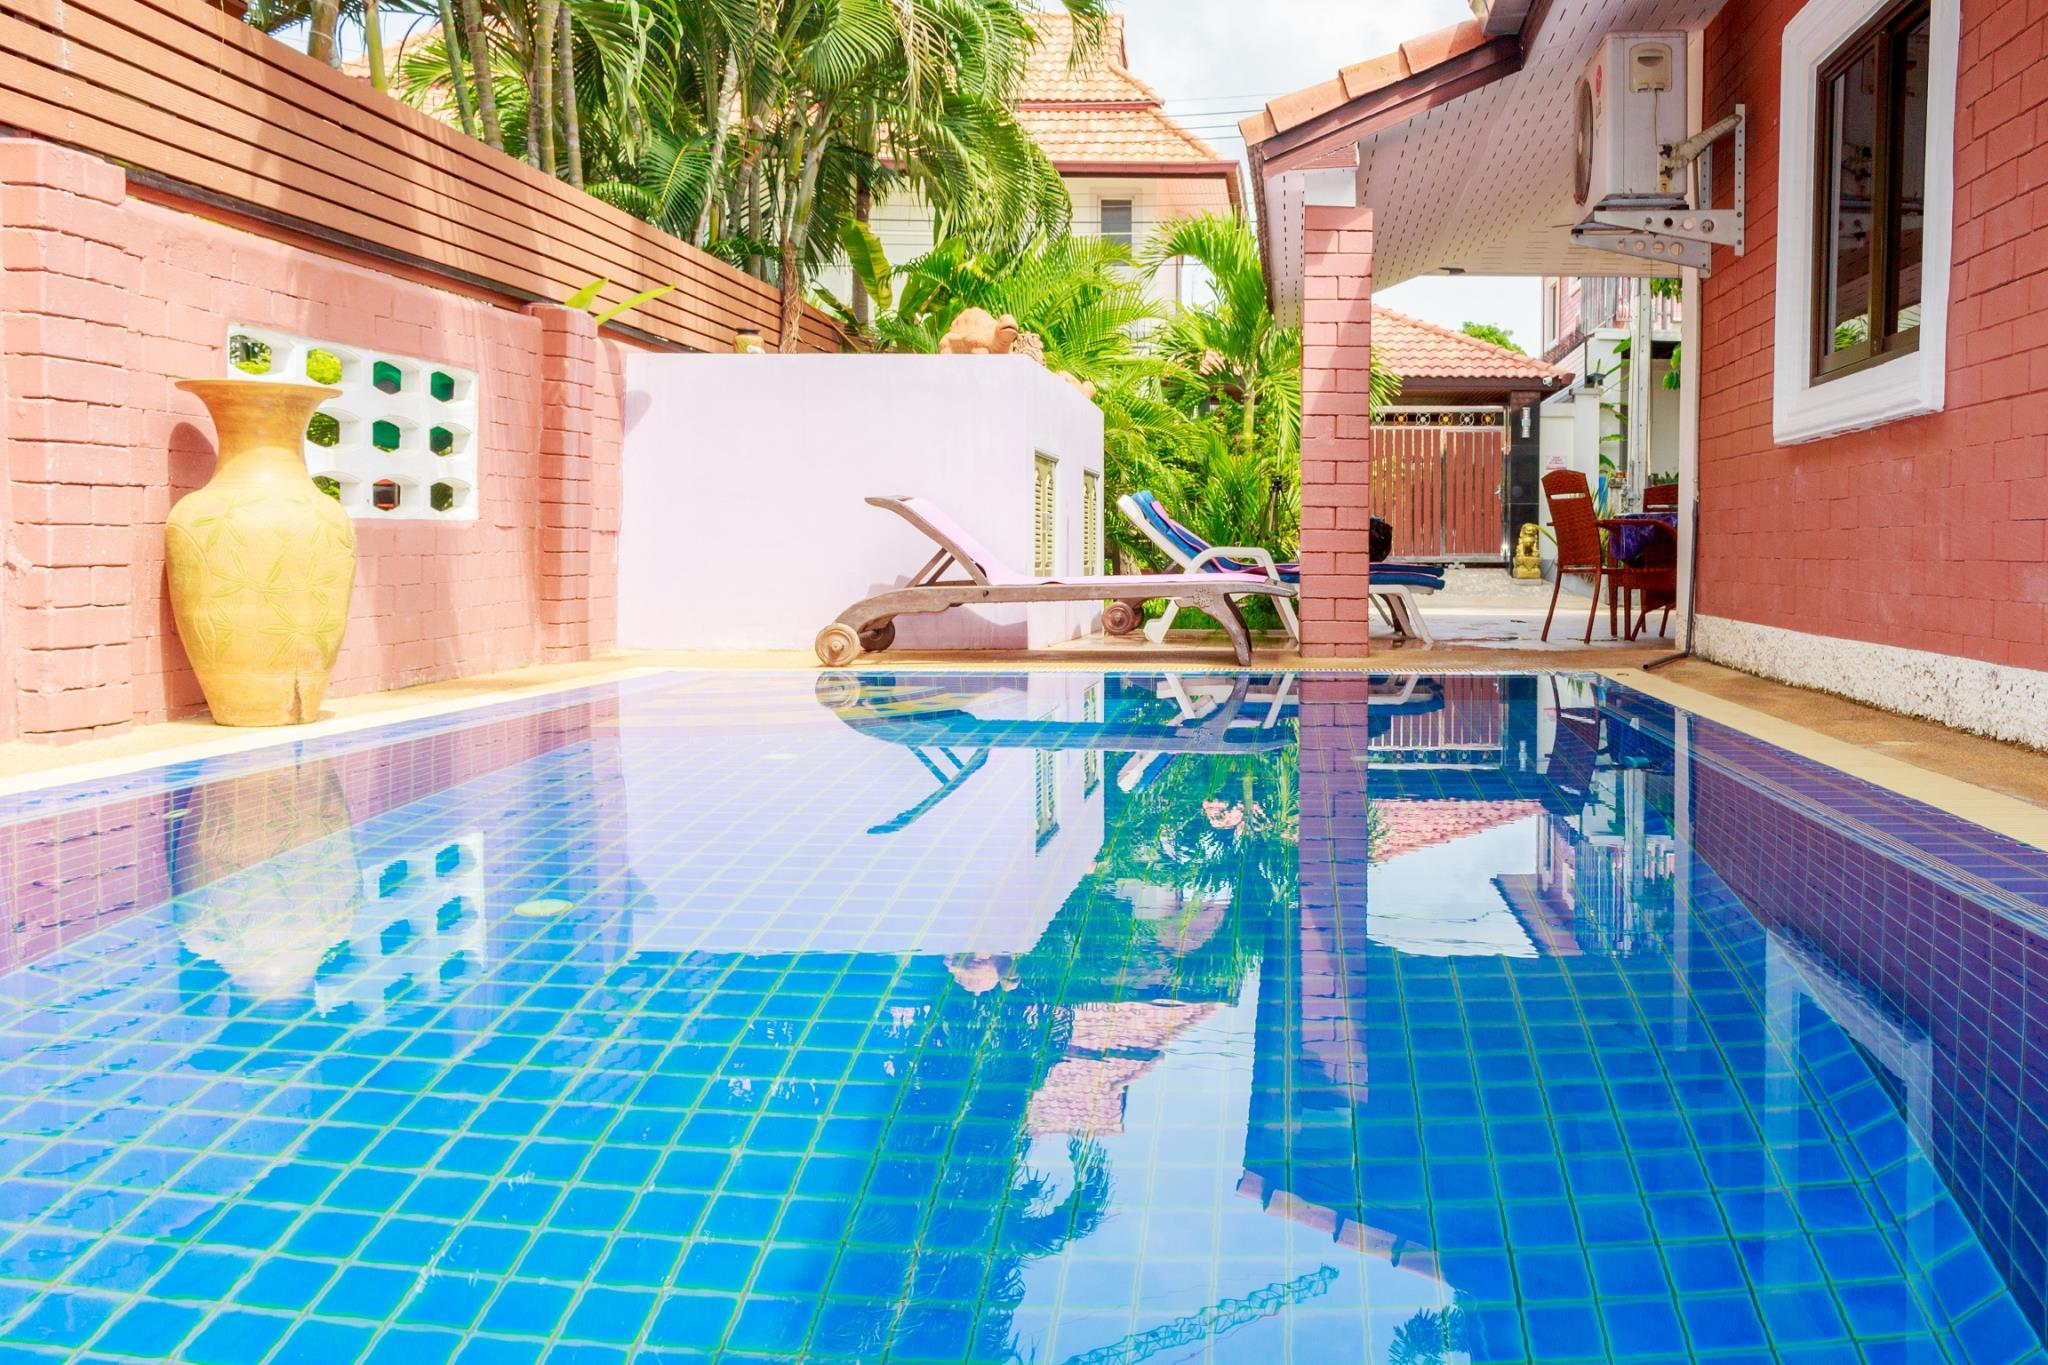 Pool villa corner 4 bedrooms near walking street,Pool villa corner 4 bedrooms near walking street